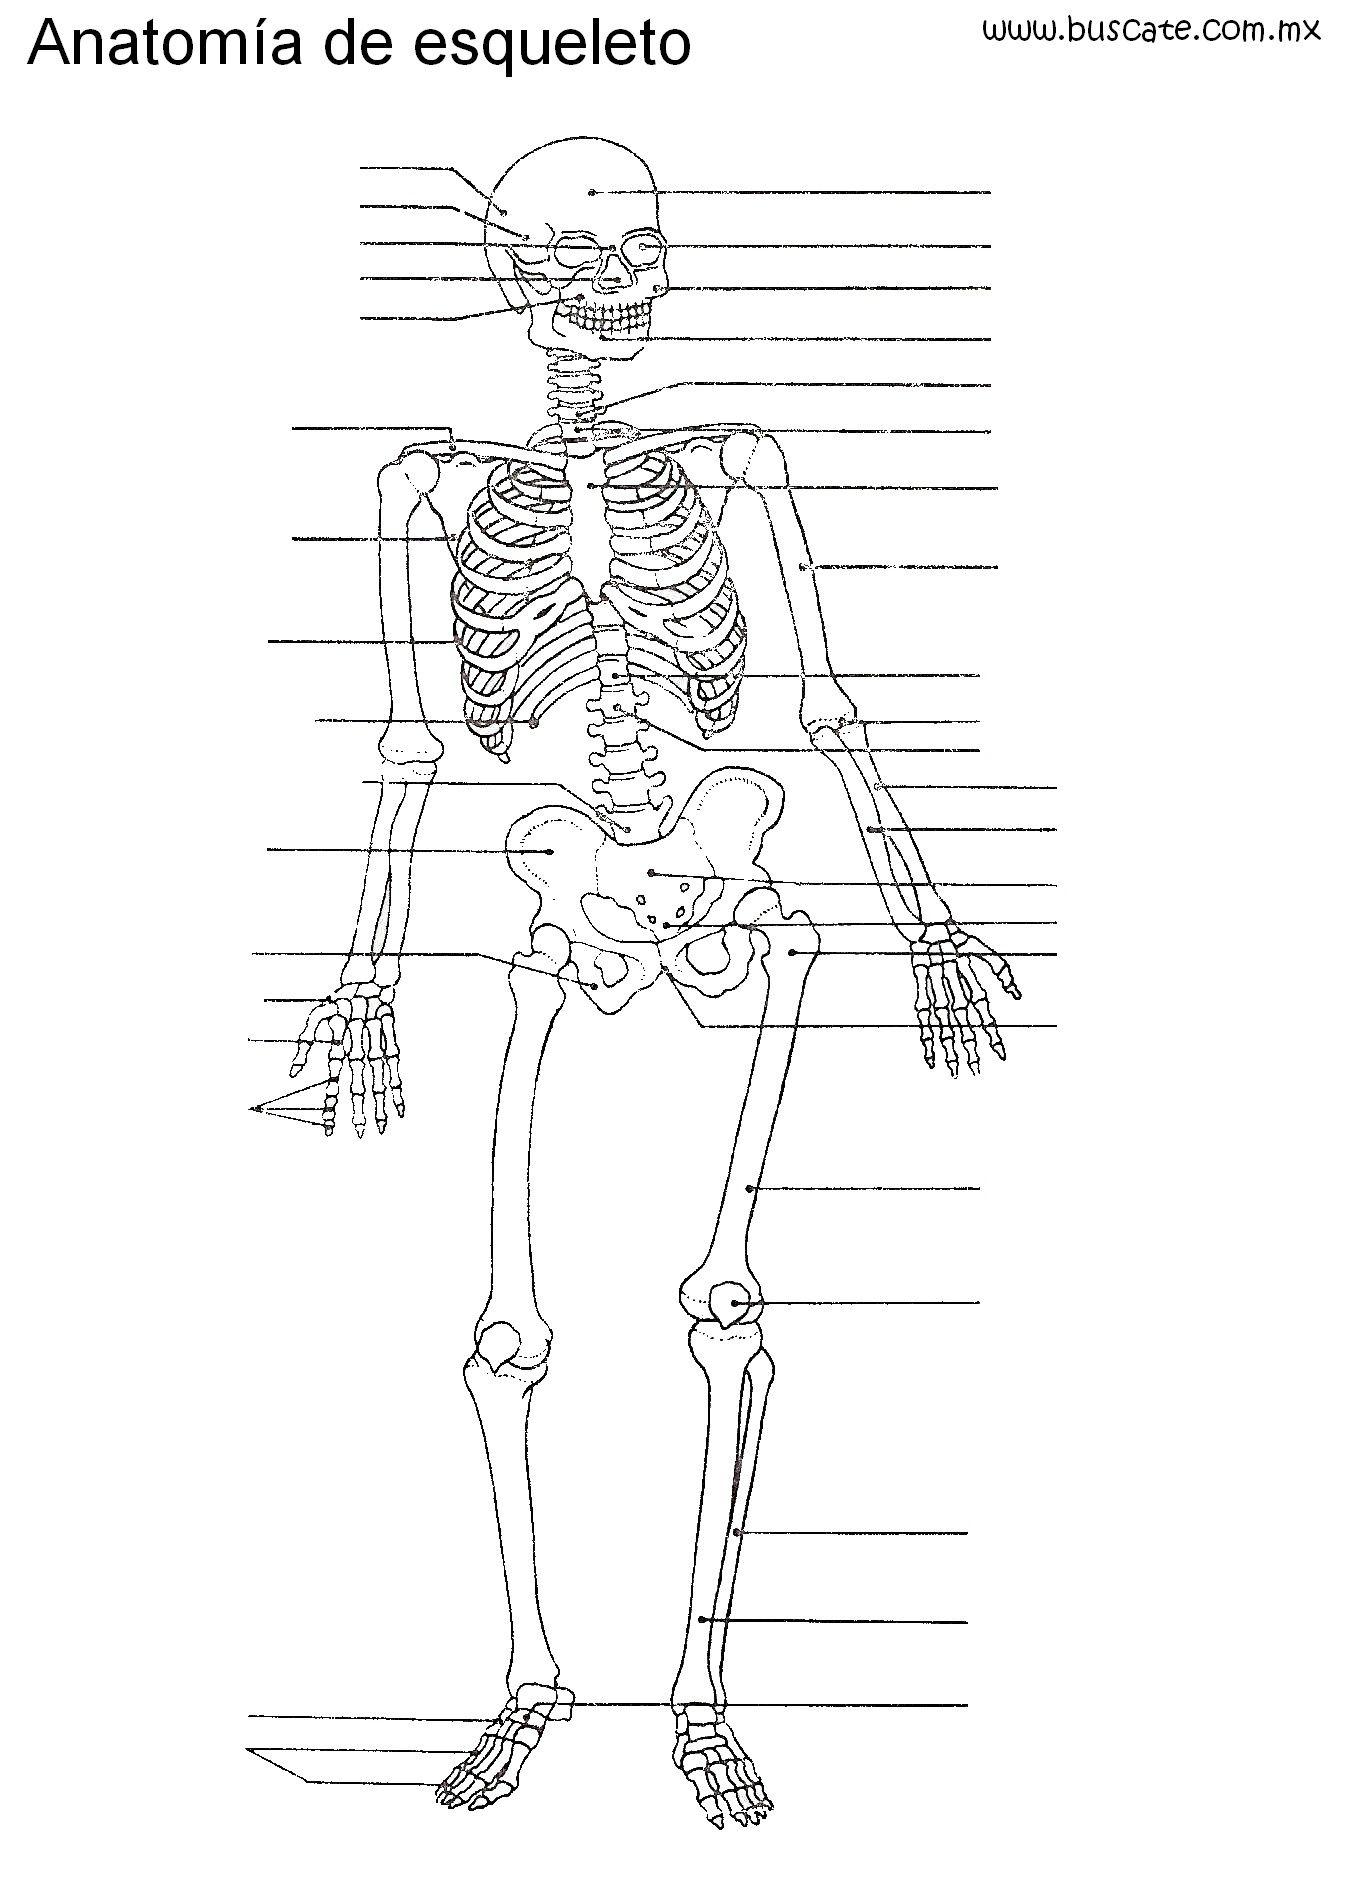 Esqueleto humano sin nombres, para escribirlos. | eSQUELETO ...